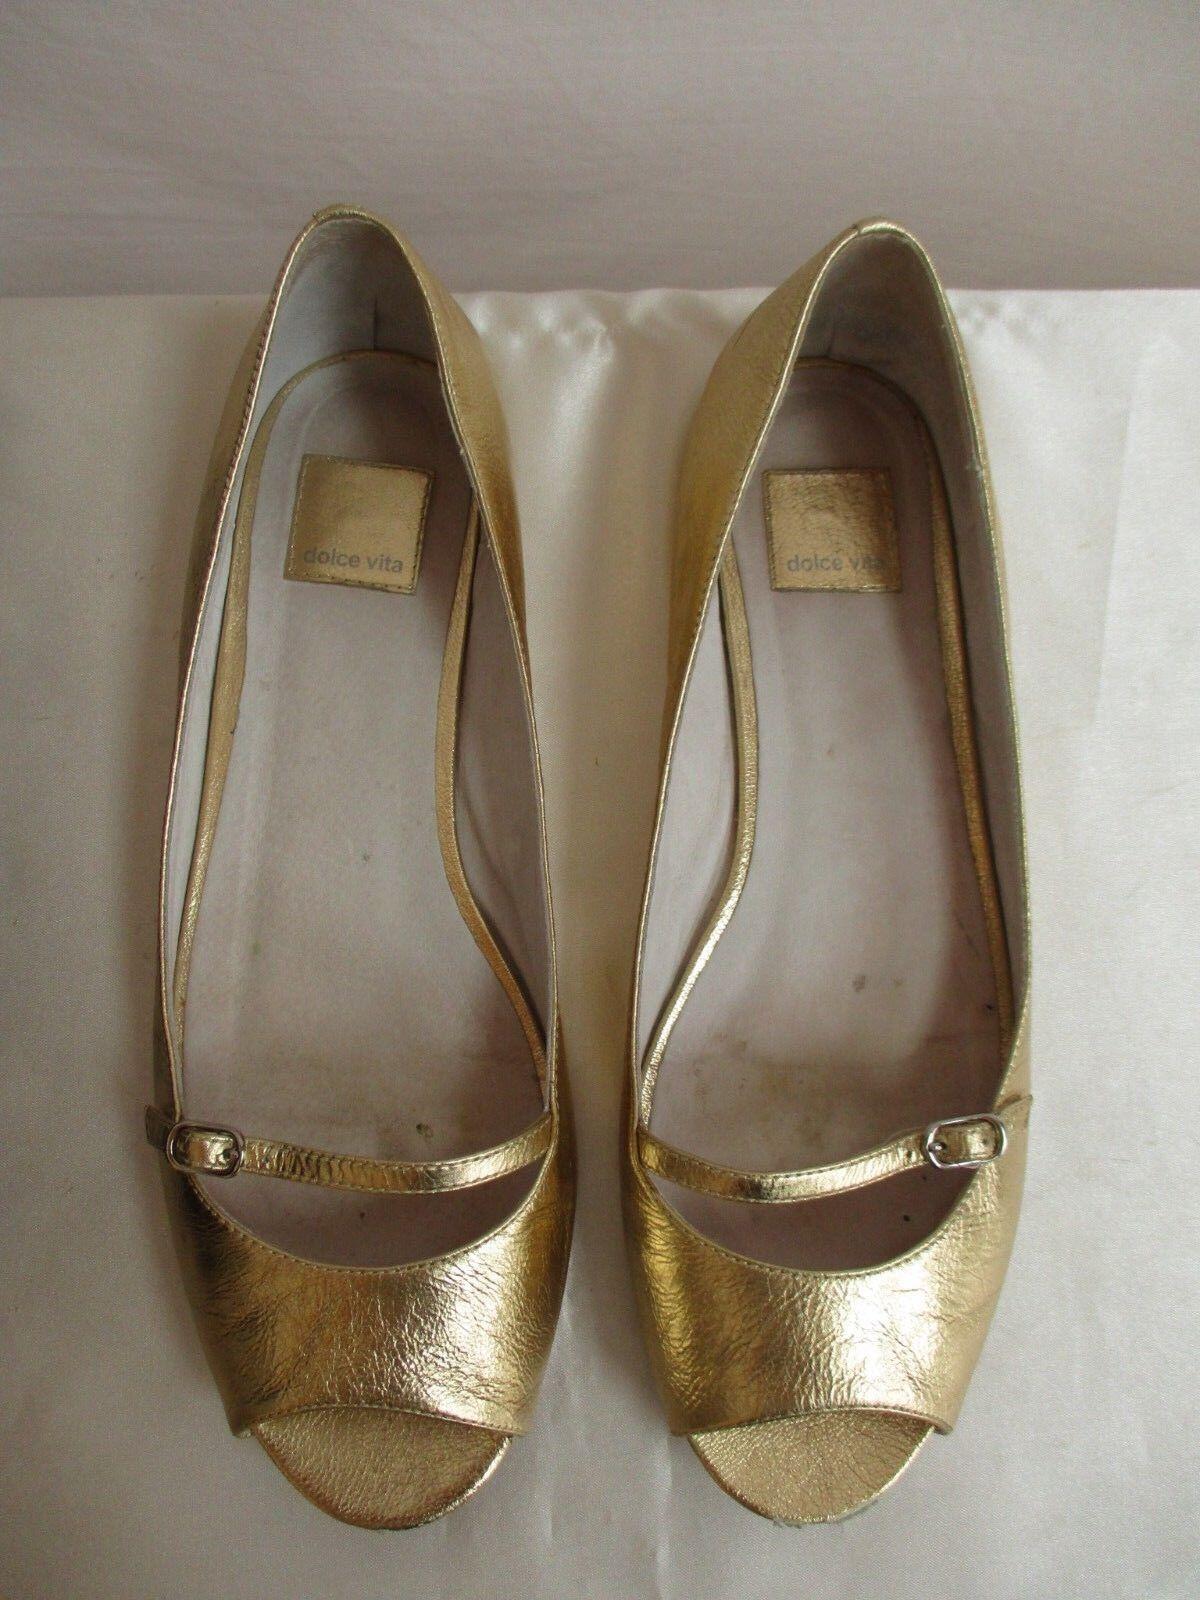 Dolce Vita Size 8.5 Open Toe Flat Mary Jane Vienna 22 Gold Flash Rare Find